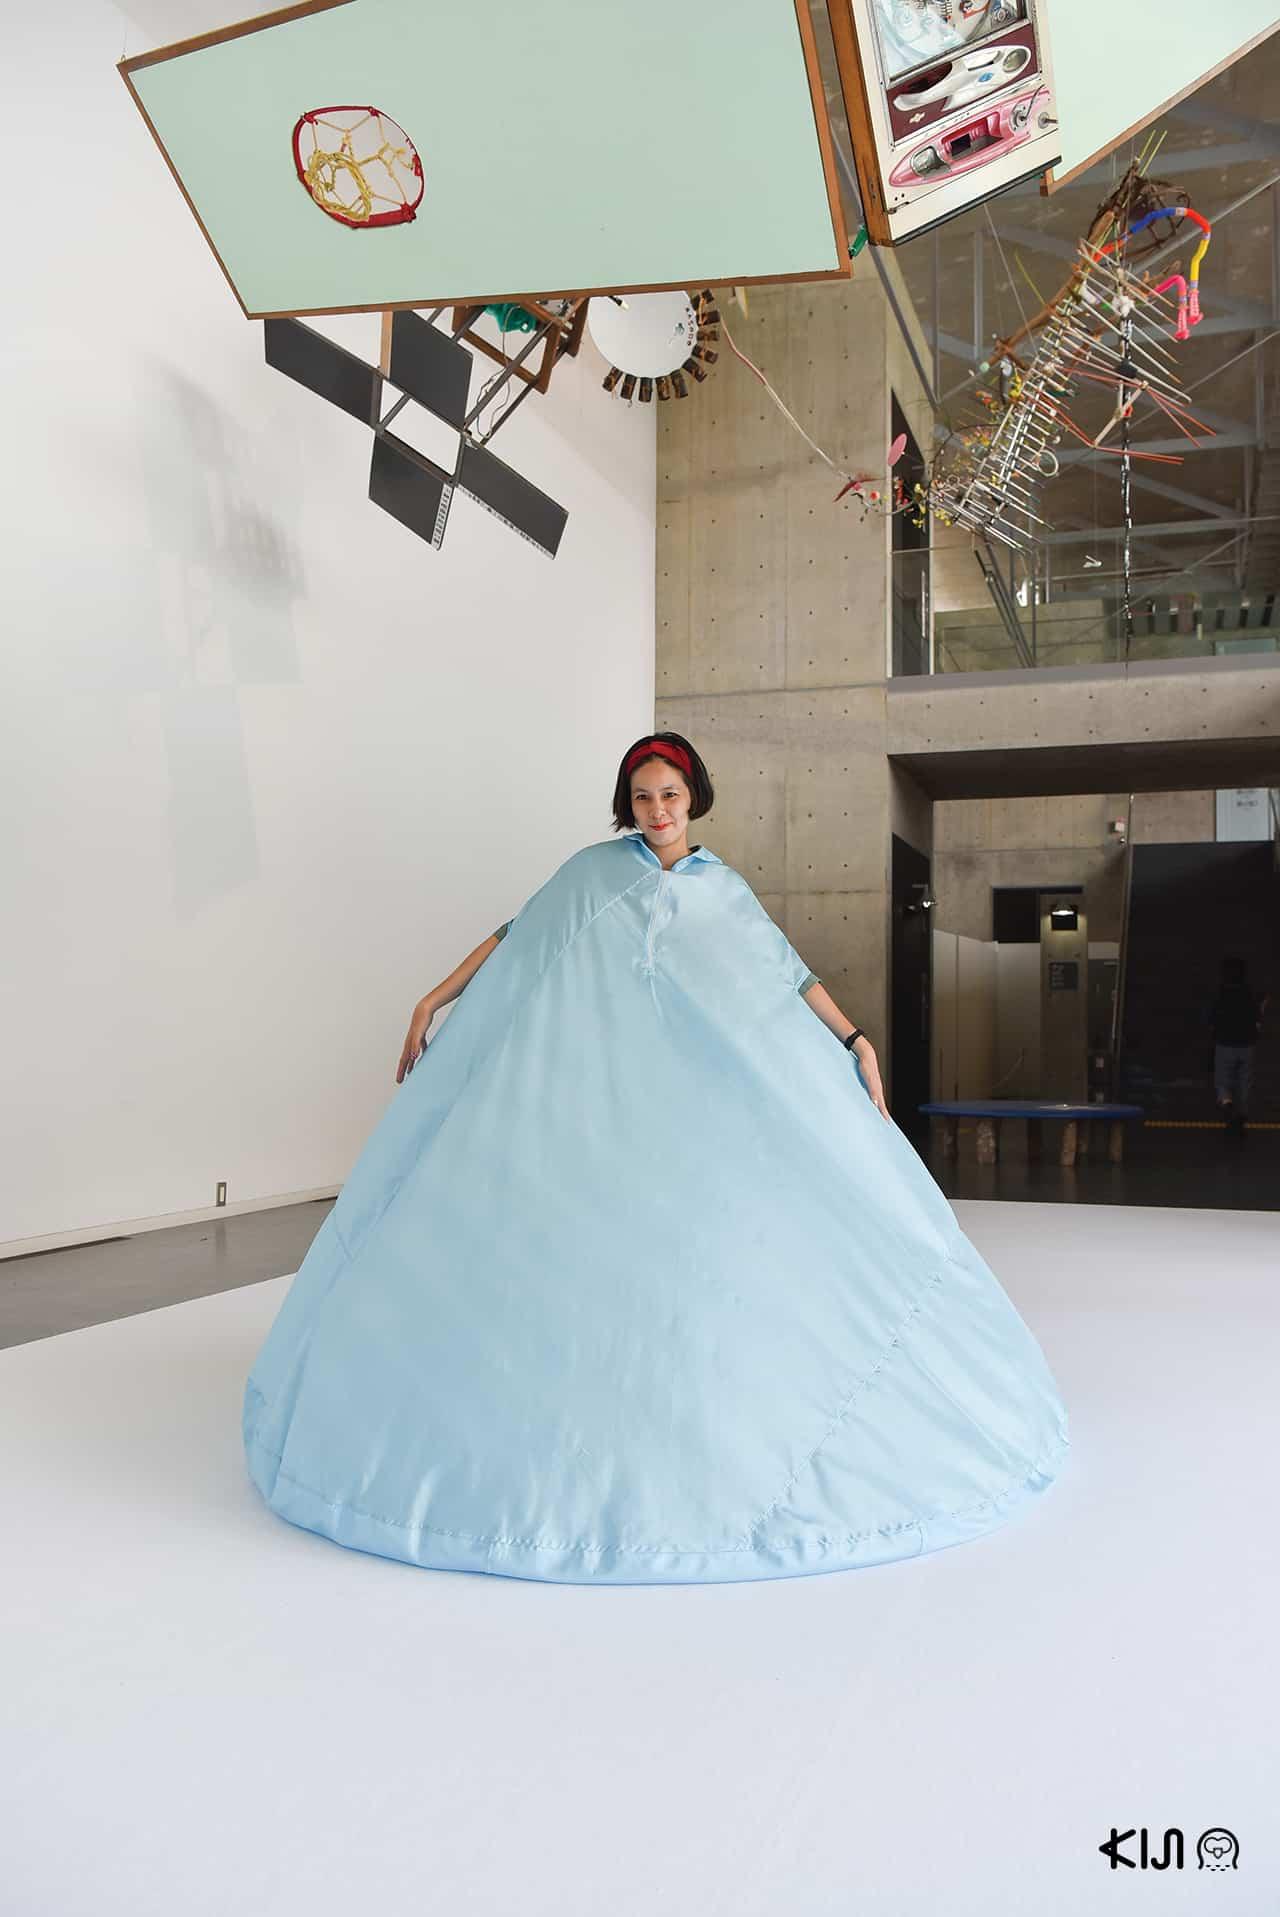 Echigo-Tsumari Satoyama Museum of Contemporary Art KINARE